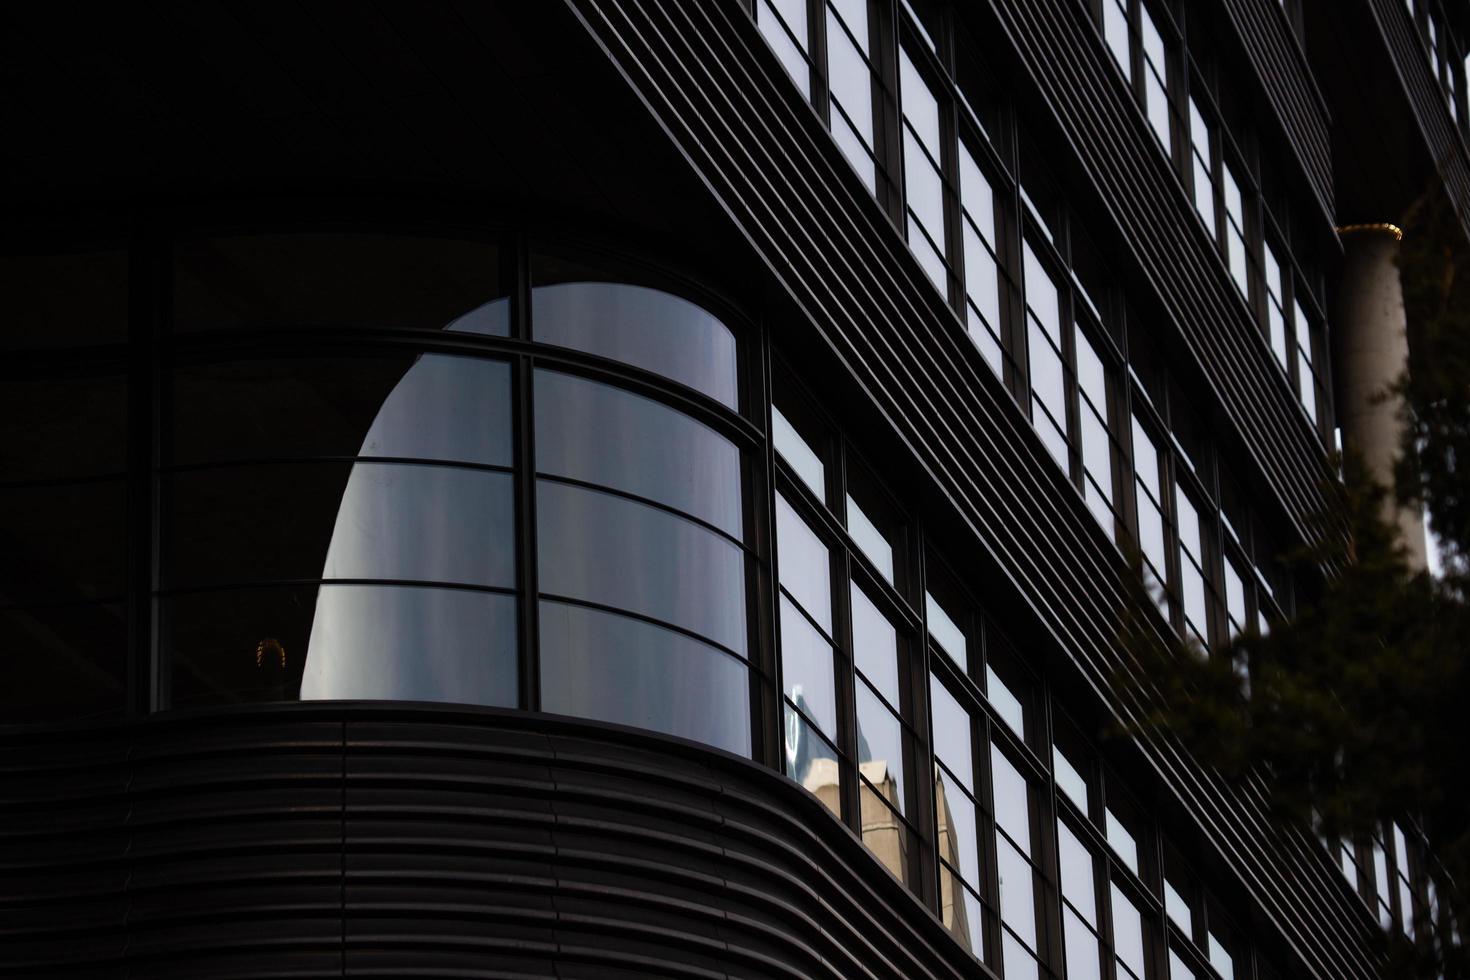 New York City, 2020 - Black modern building photo